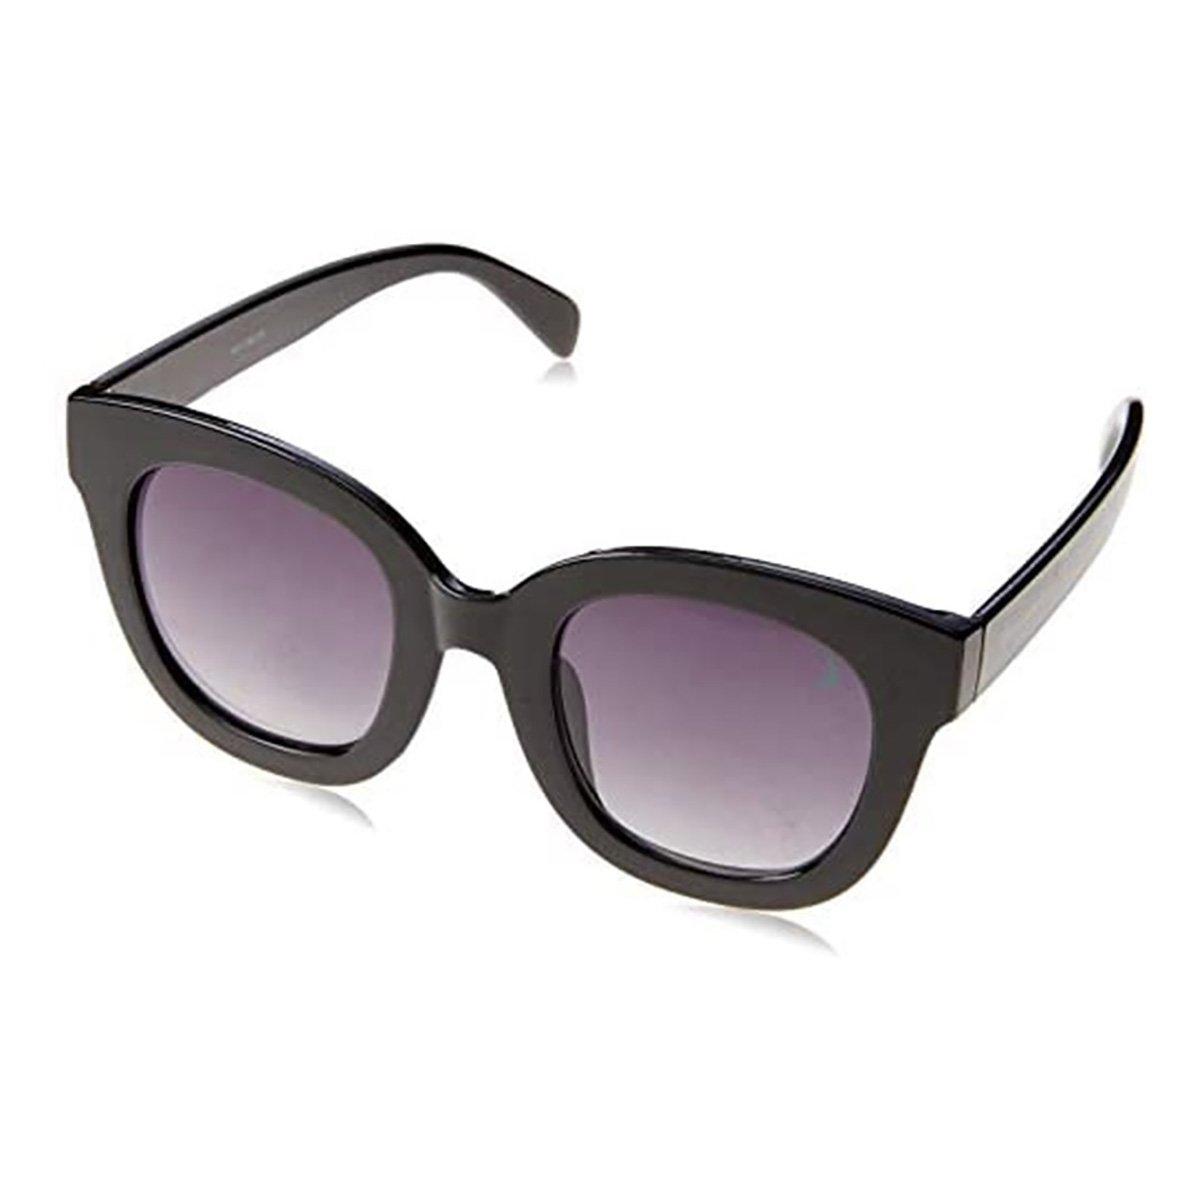 Óculos de Sol Polo London Club NY18016 Feminino